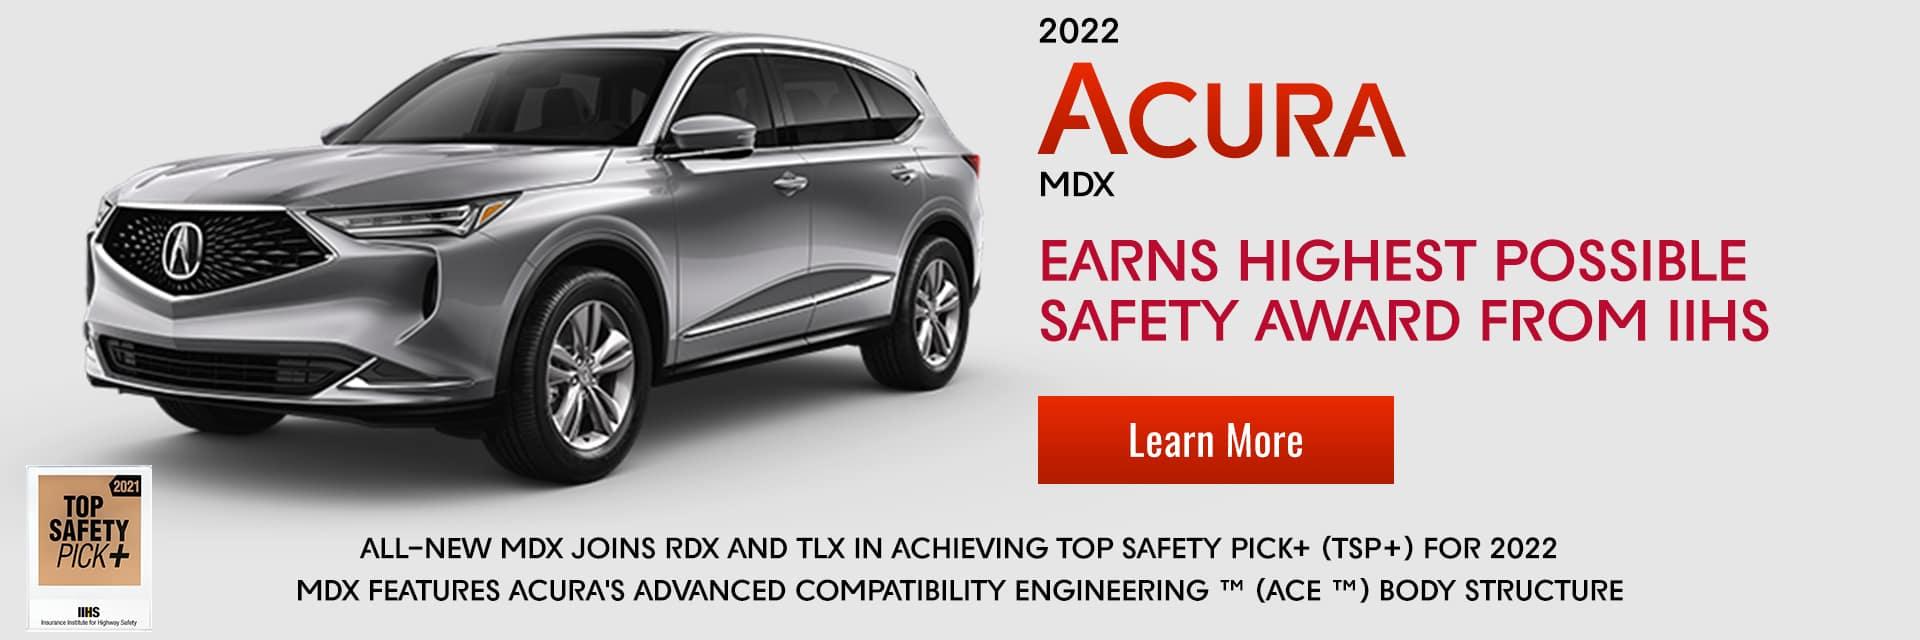 2022 Acura